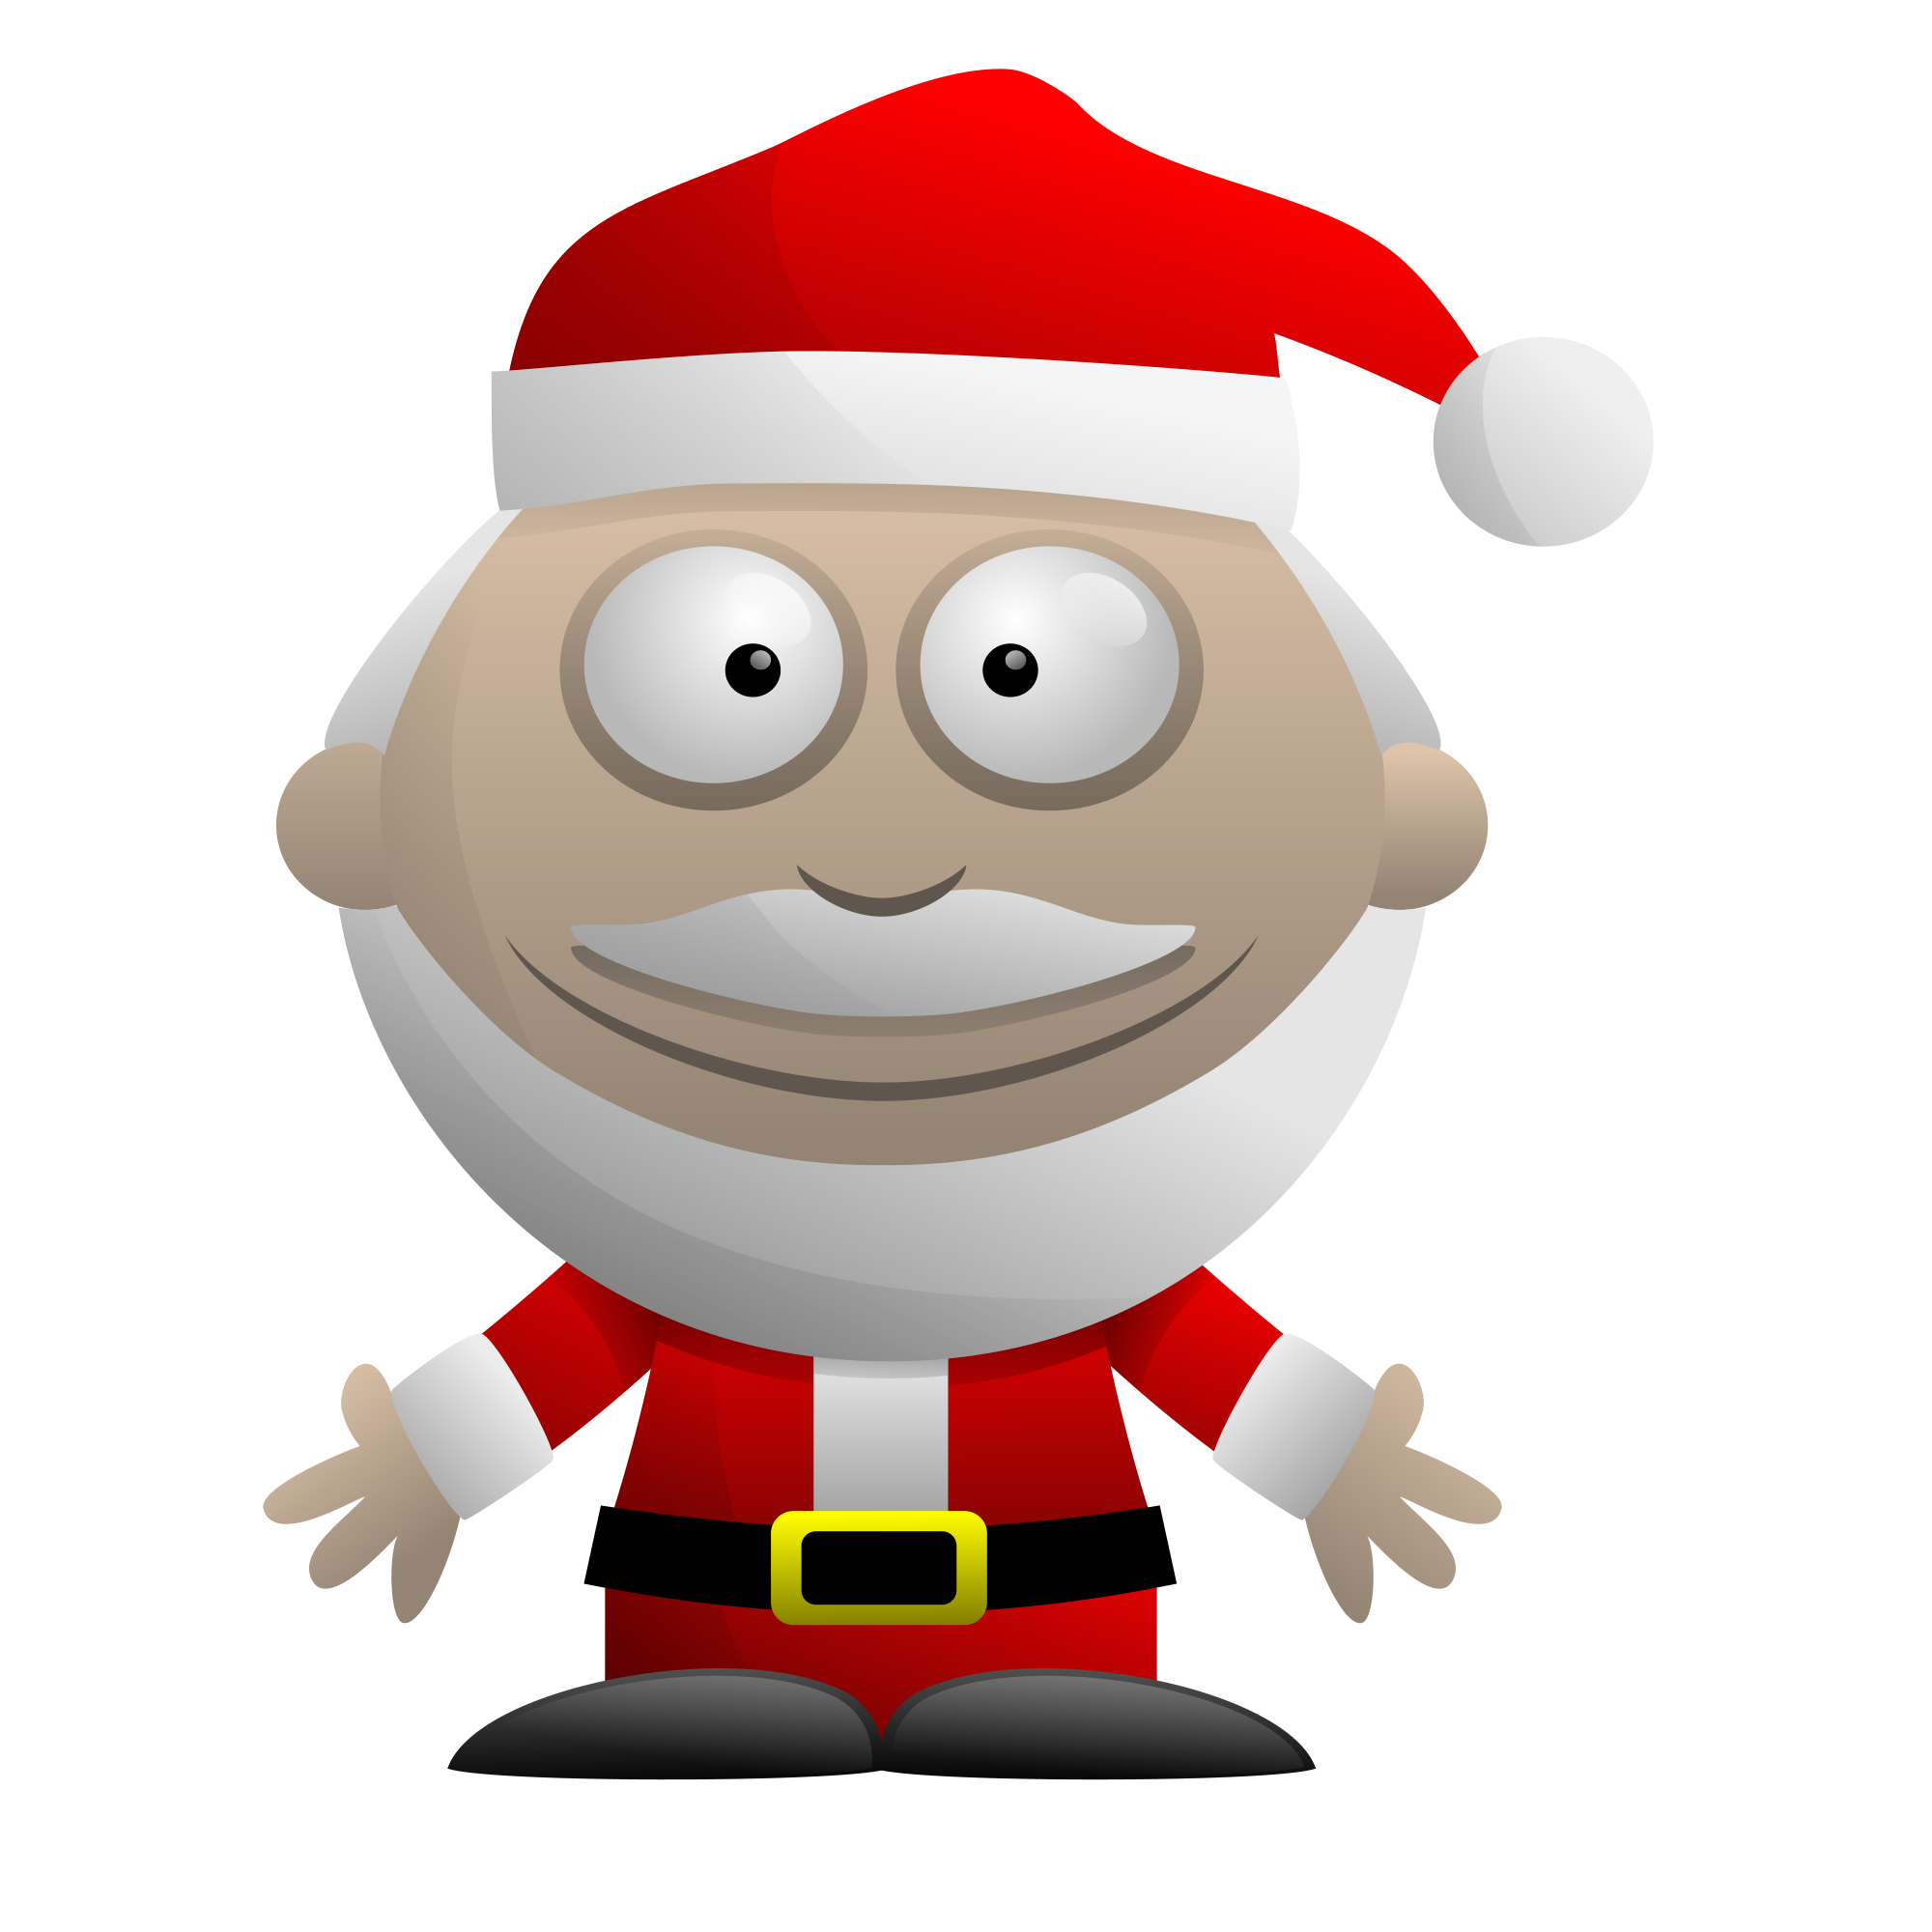 2000x2000 Christmas Theme For Preschool